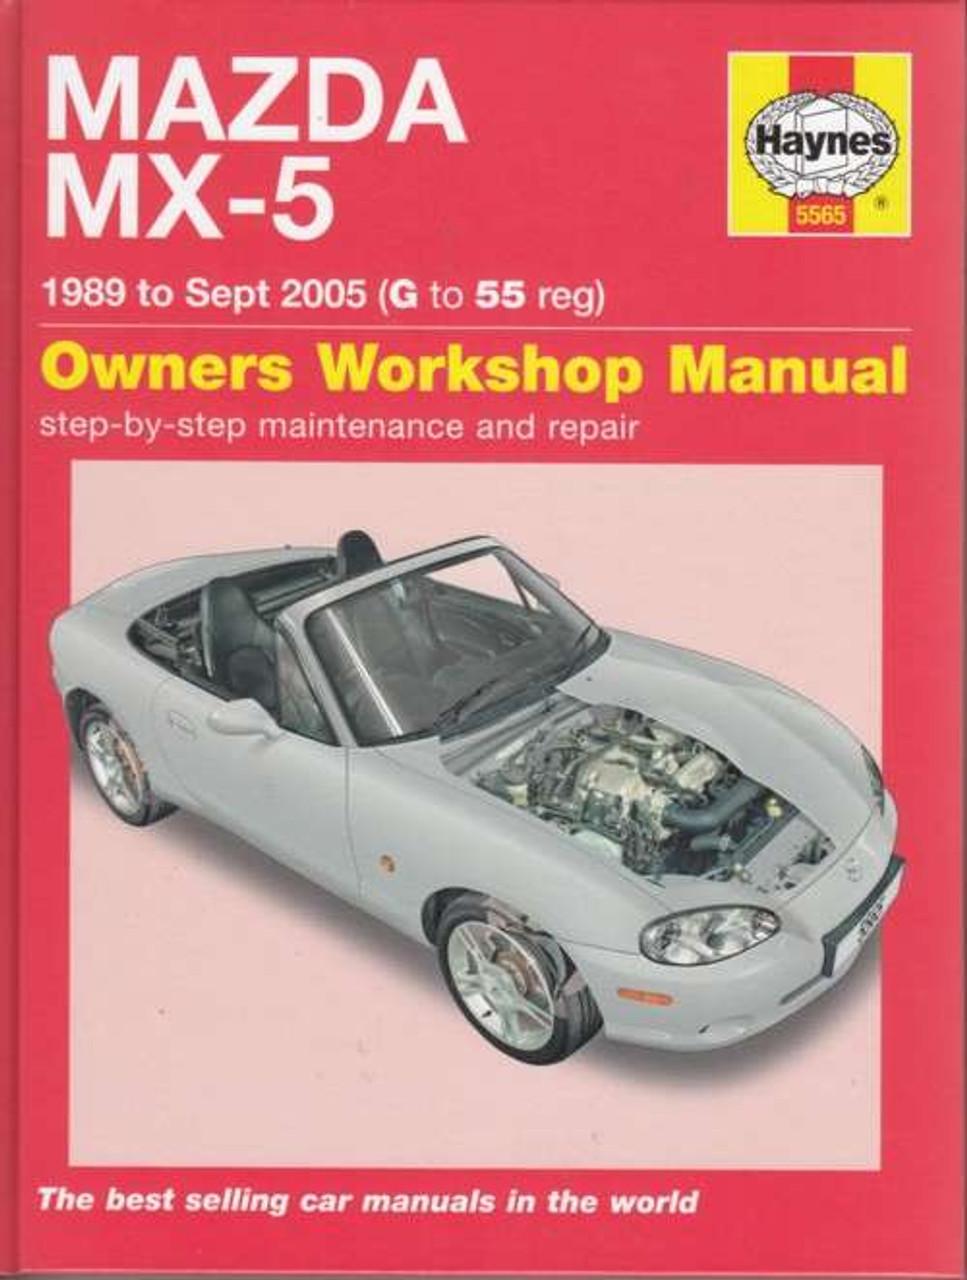 Mazda MX-5 MK1, MK2, MK2 1/2 1 6L, 1 8L 1989 - 2005 Workshop Manual